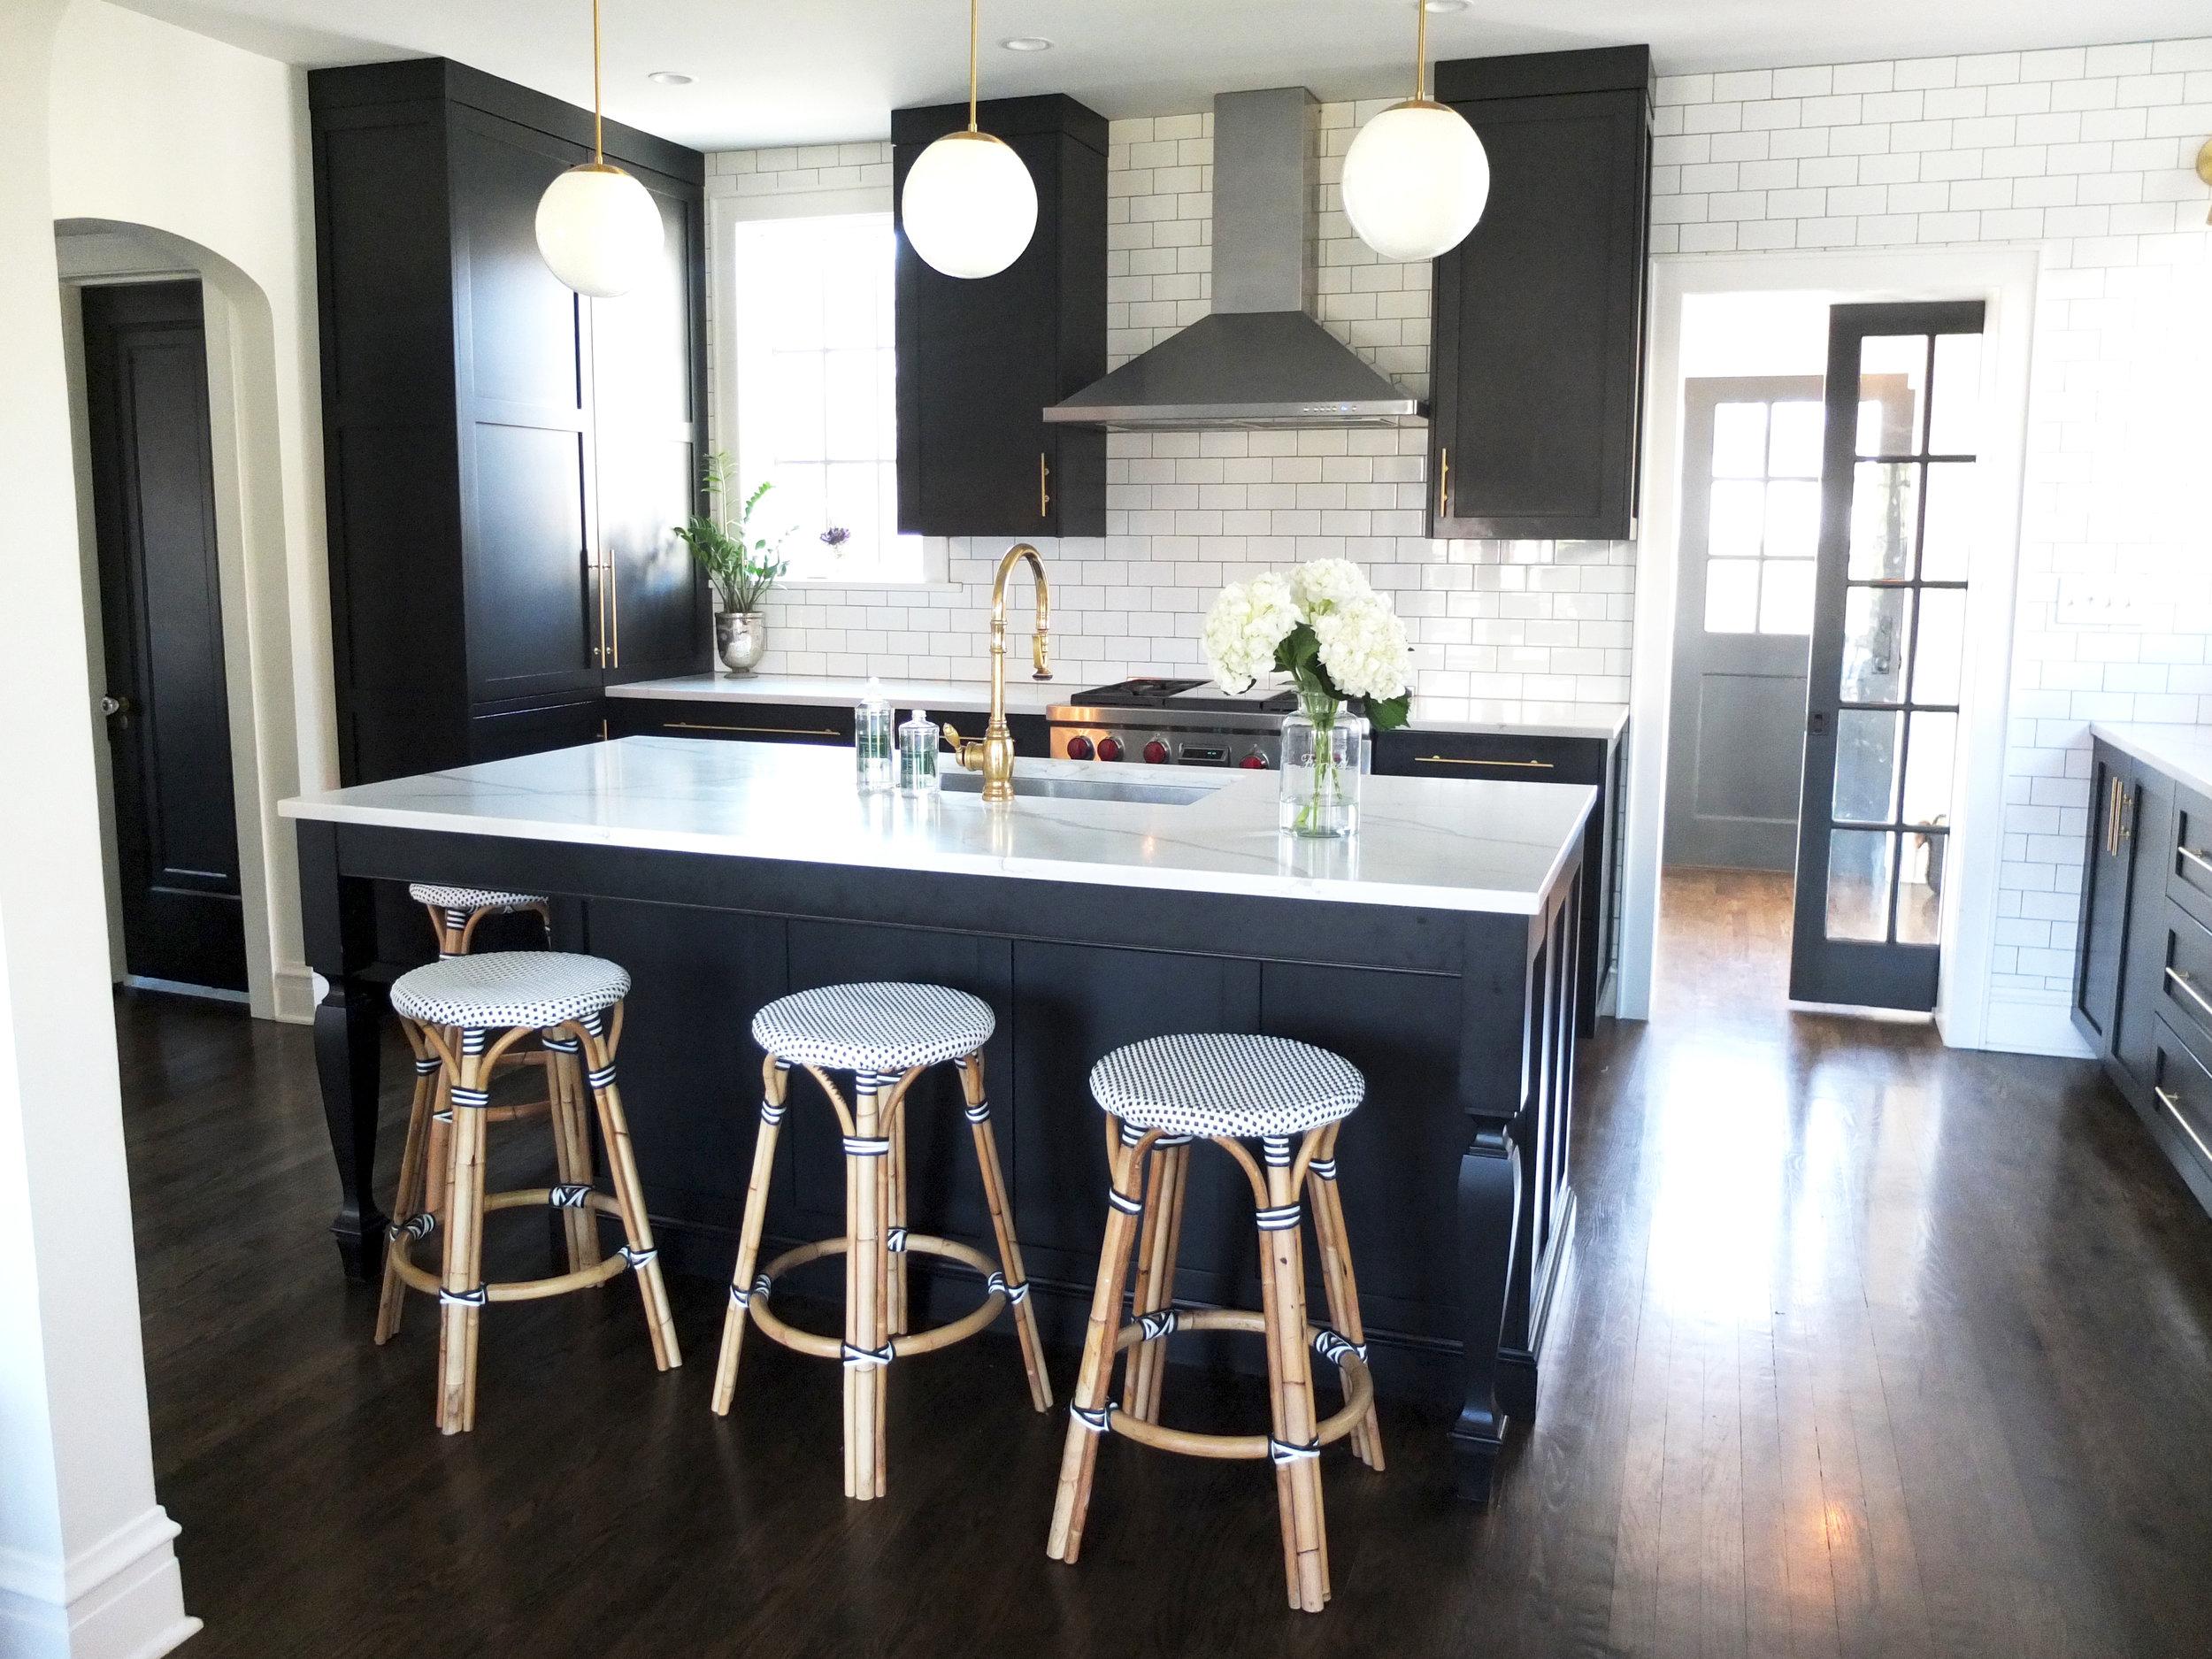 Kitchen_Full_View_DSCF0837.jpg